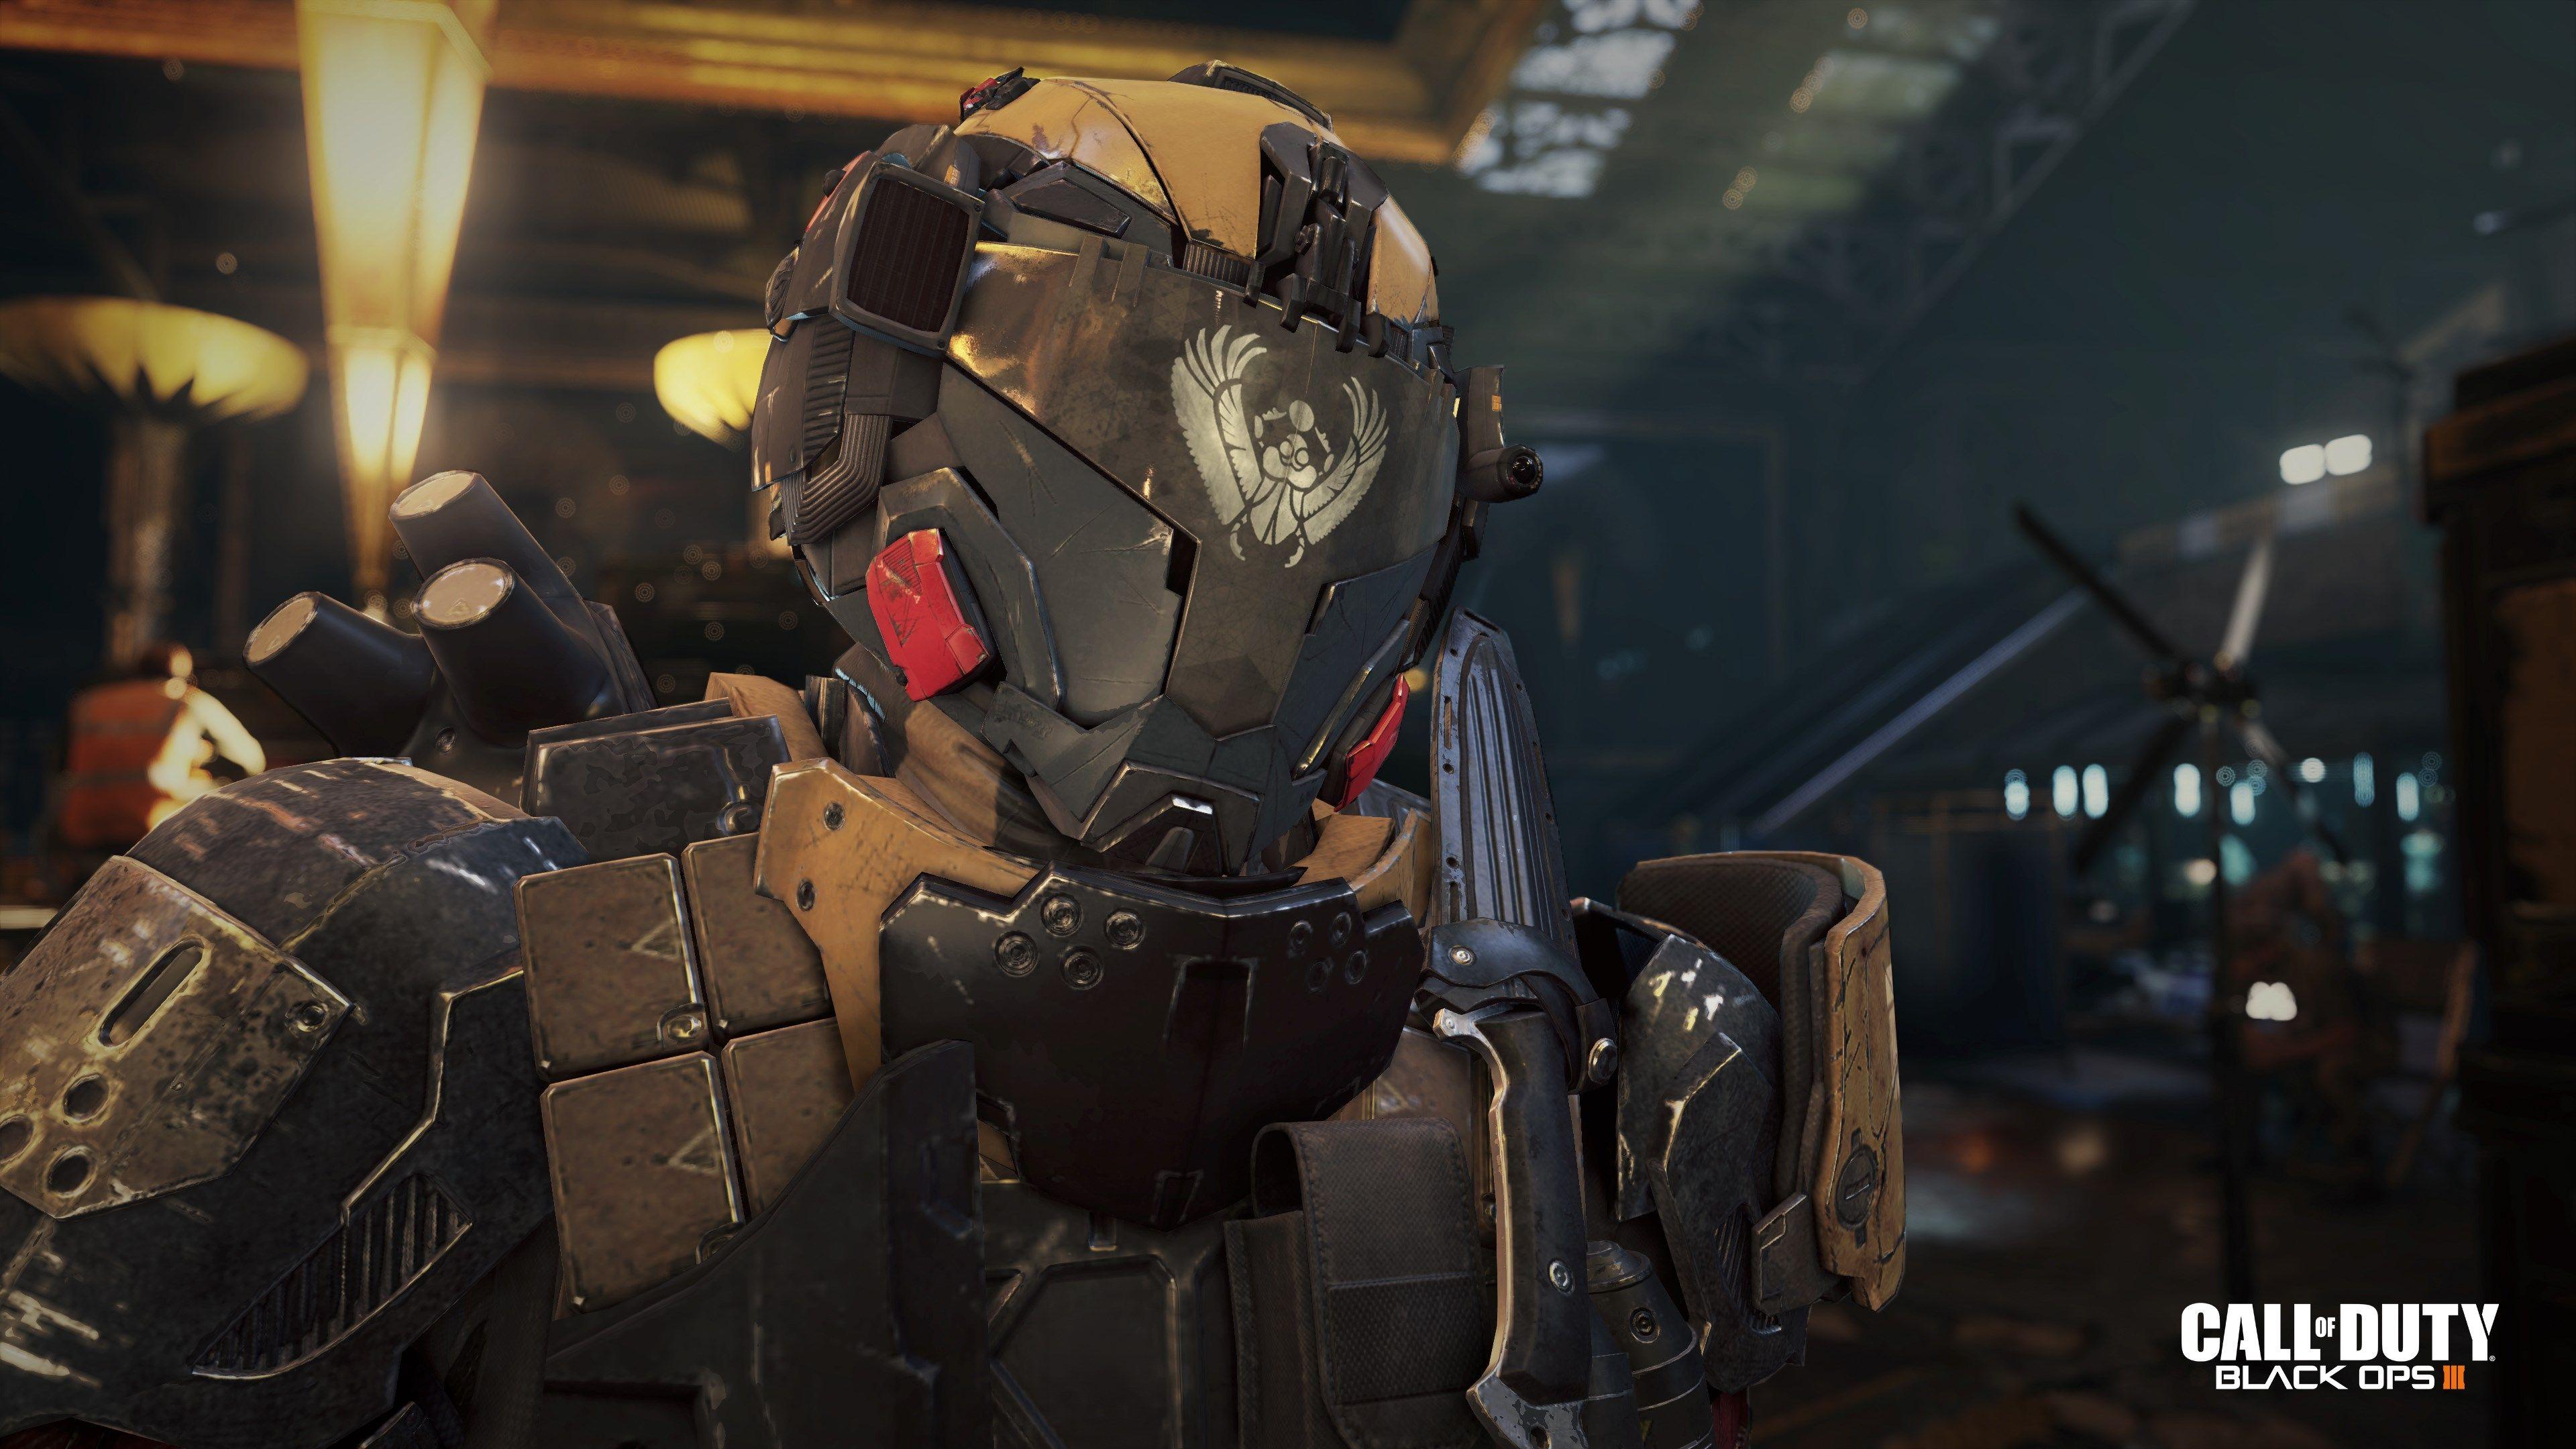 Call Of Duty Black Ops Iii 4k Wallpaper 3840x2160